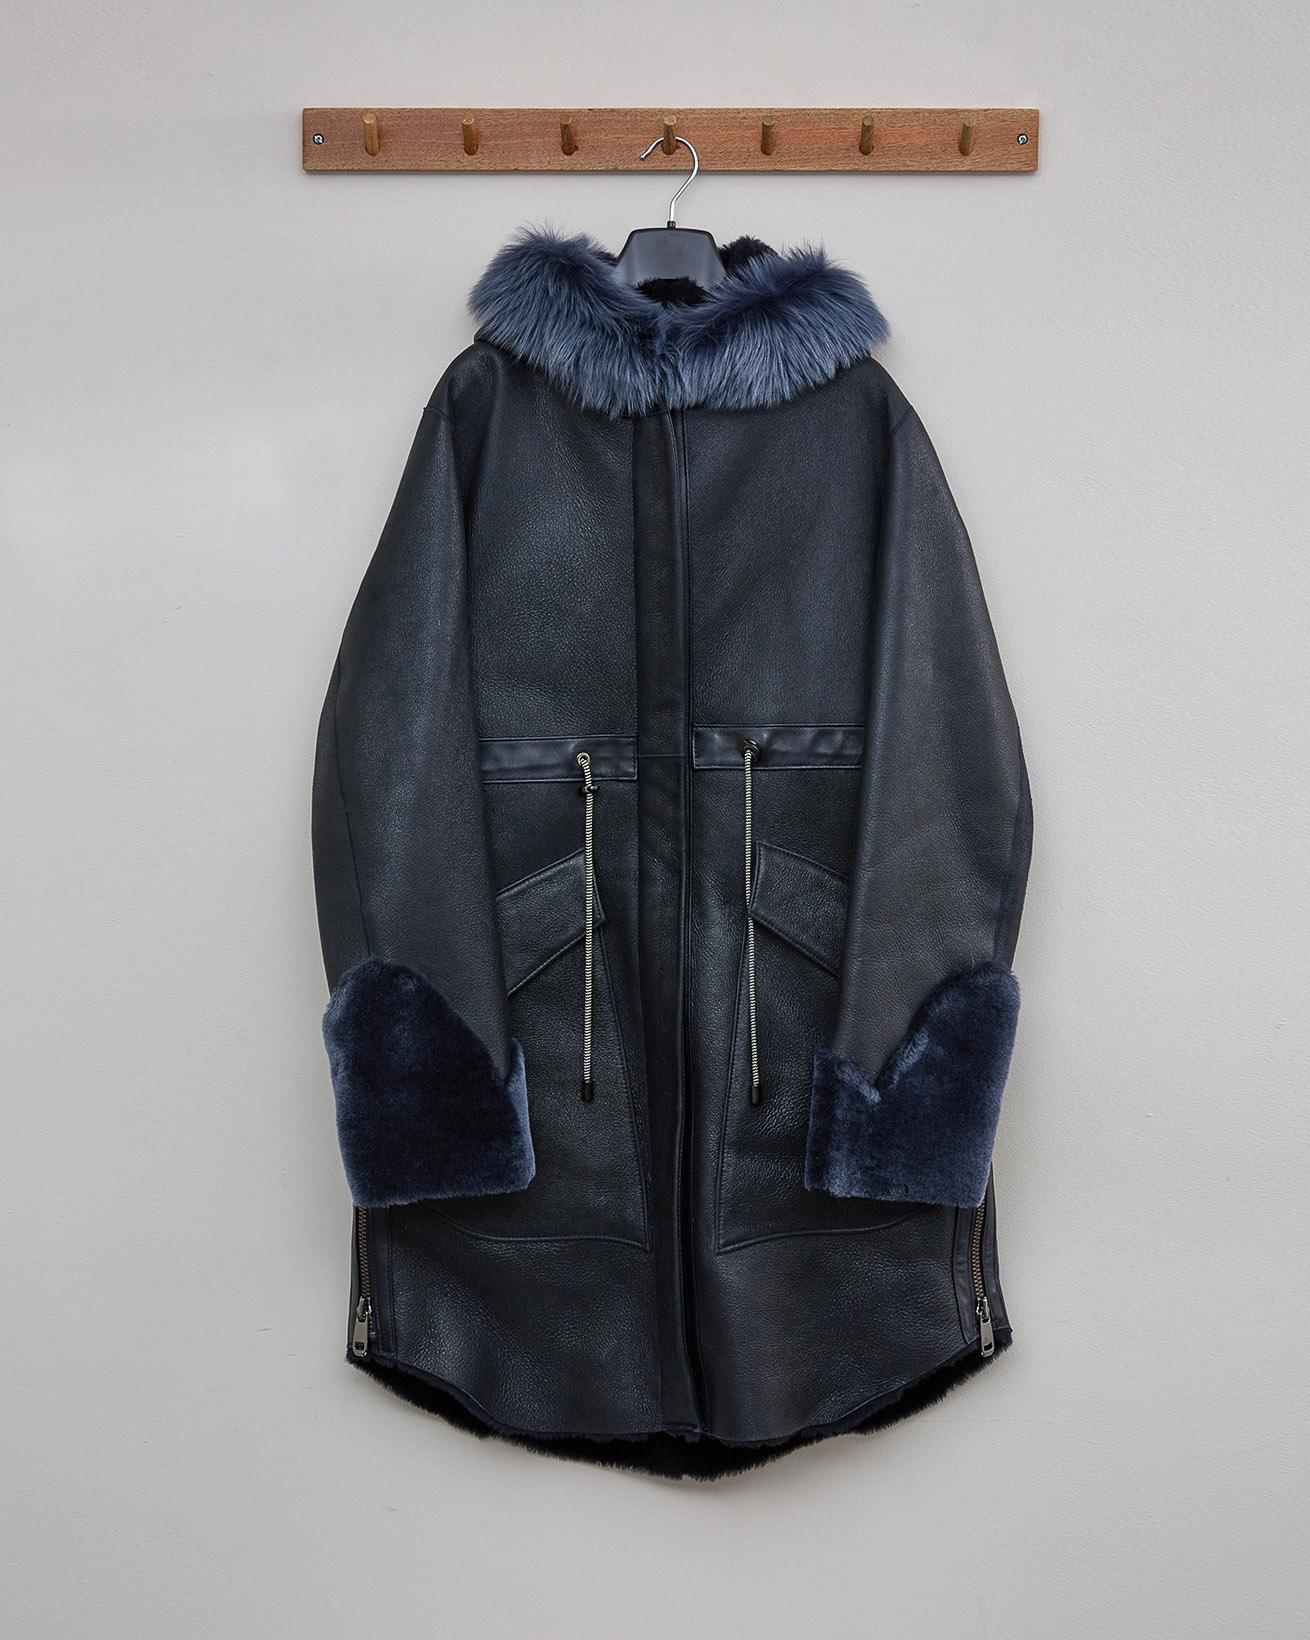 HOODED PARK COAT - DARK NAVY - Size 10 - 2555